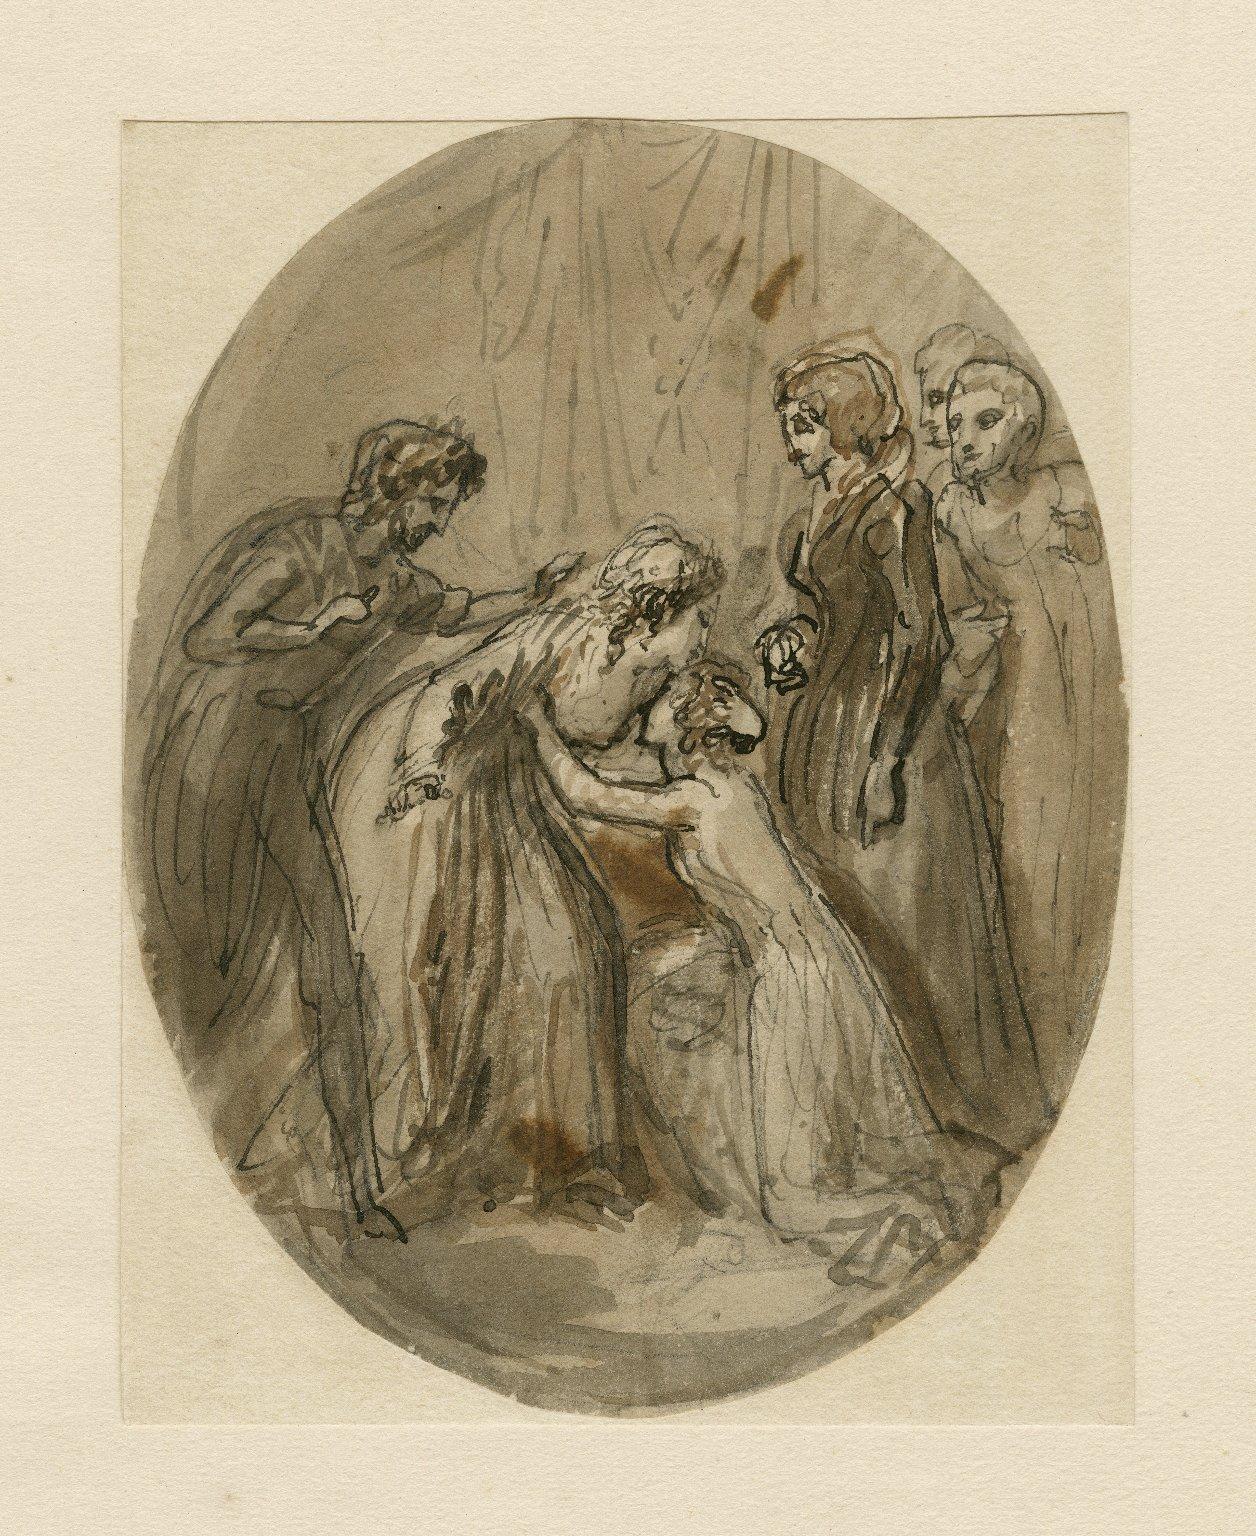 Perdita kneeling to Hermione, Winter's tale, act V, sc. 3 [graphic] / [Thomas Stothard].